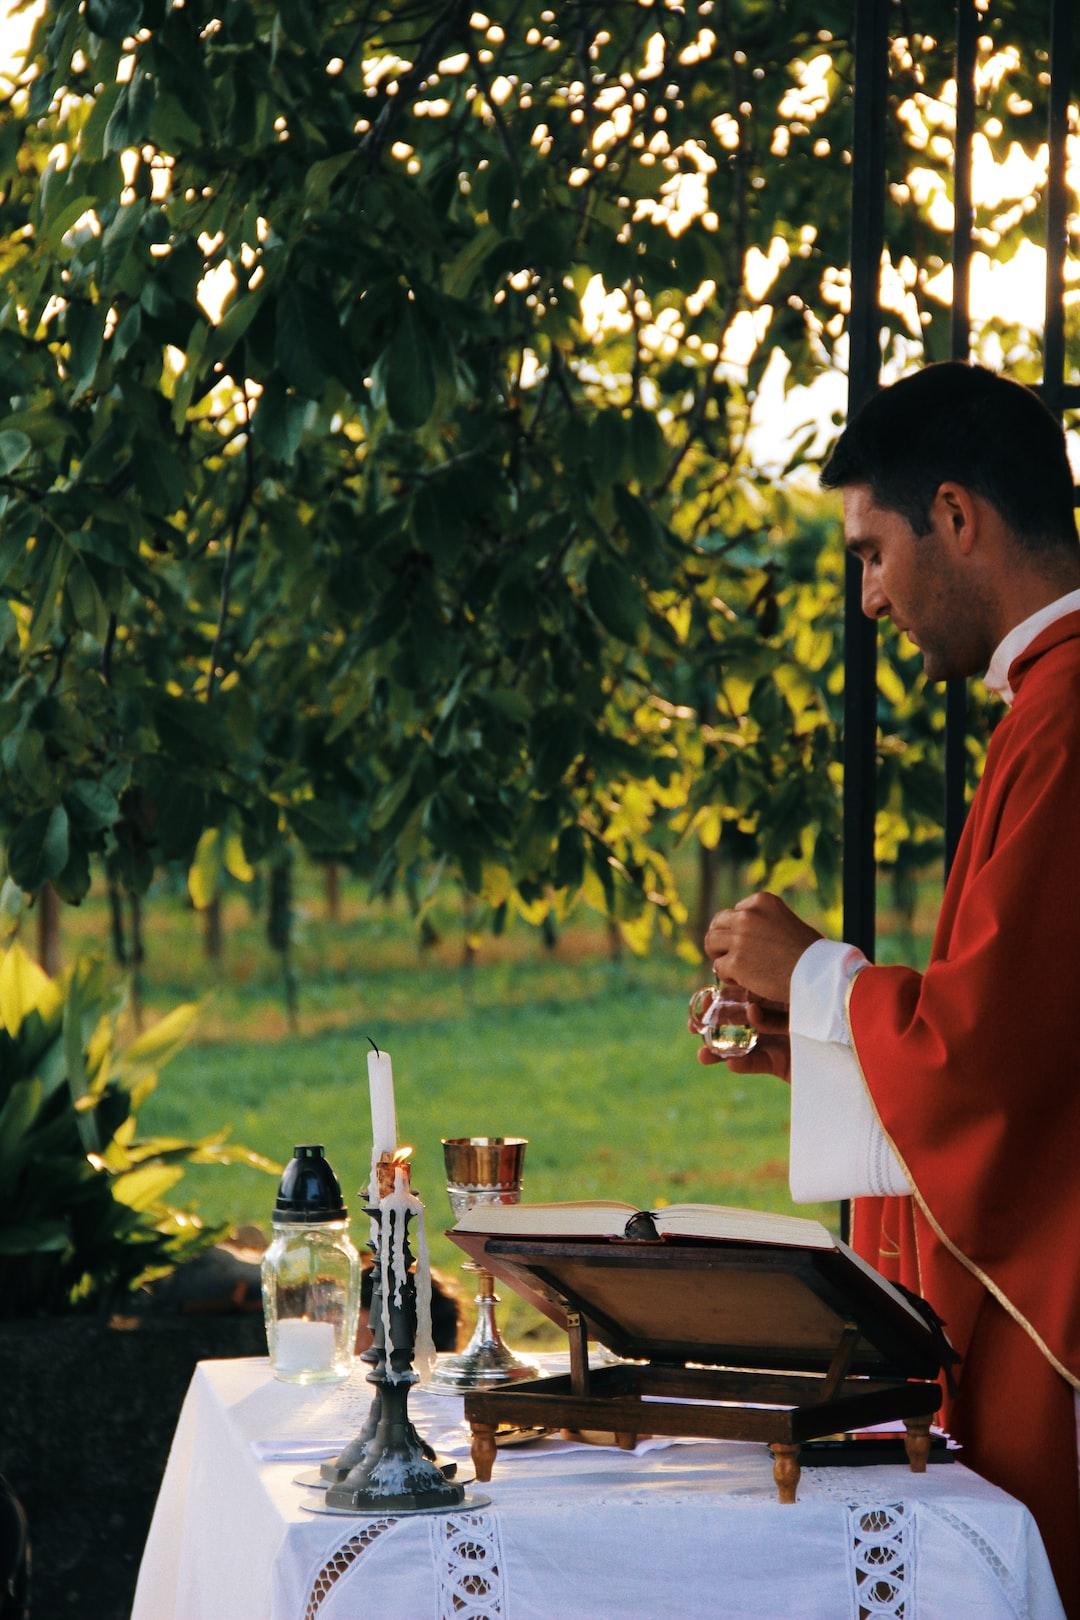 Catholic priest celebrating Mass outdoor